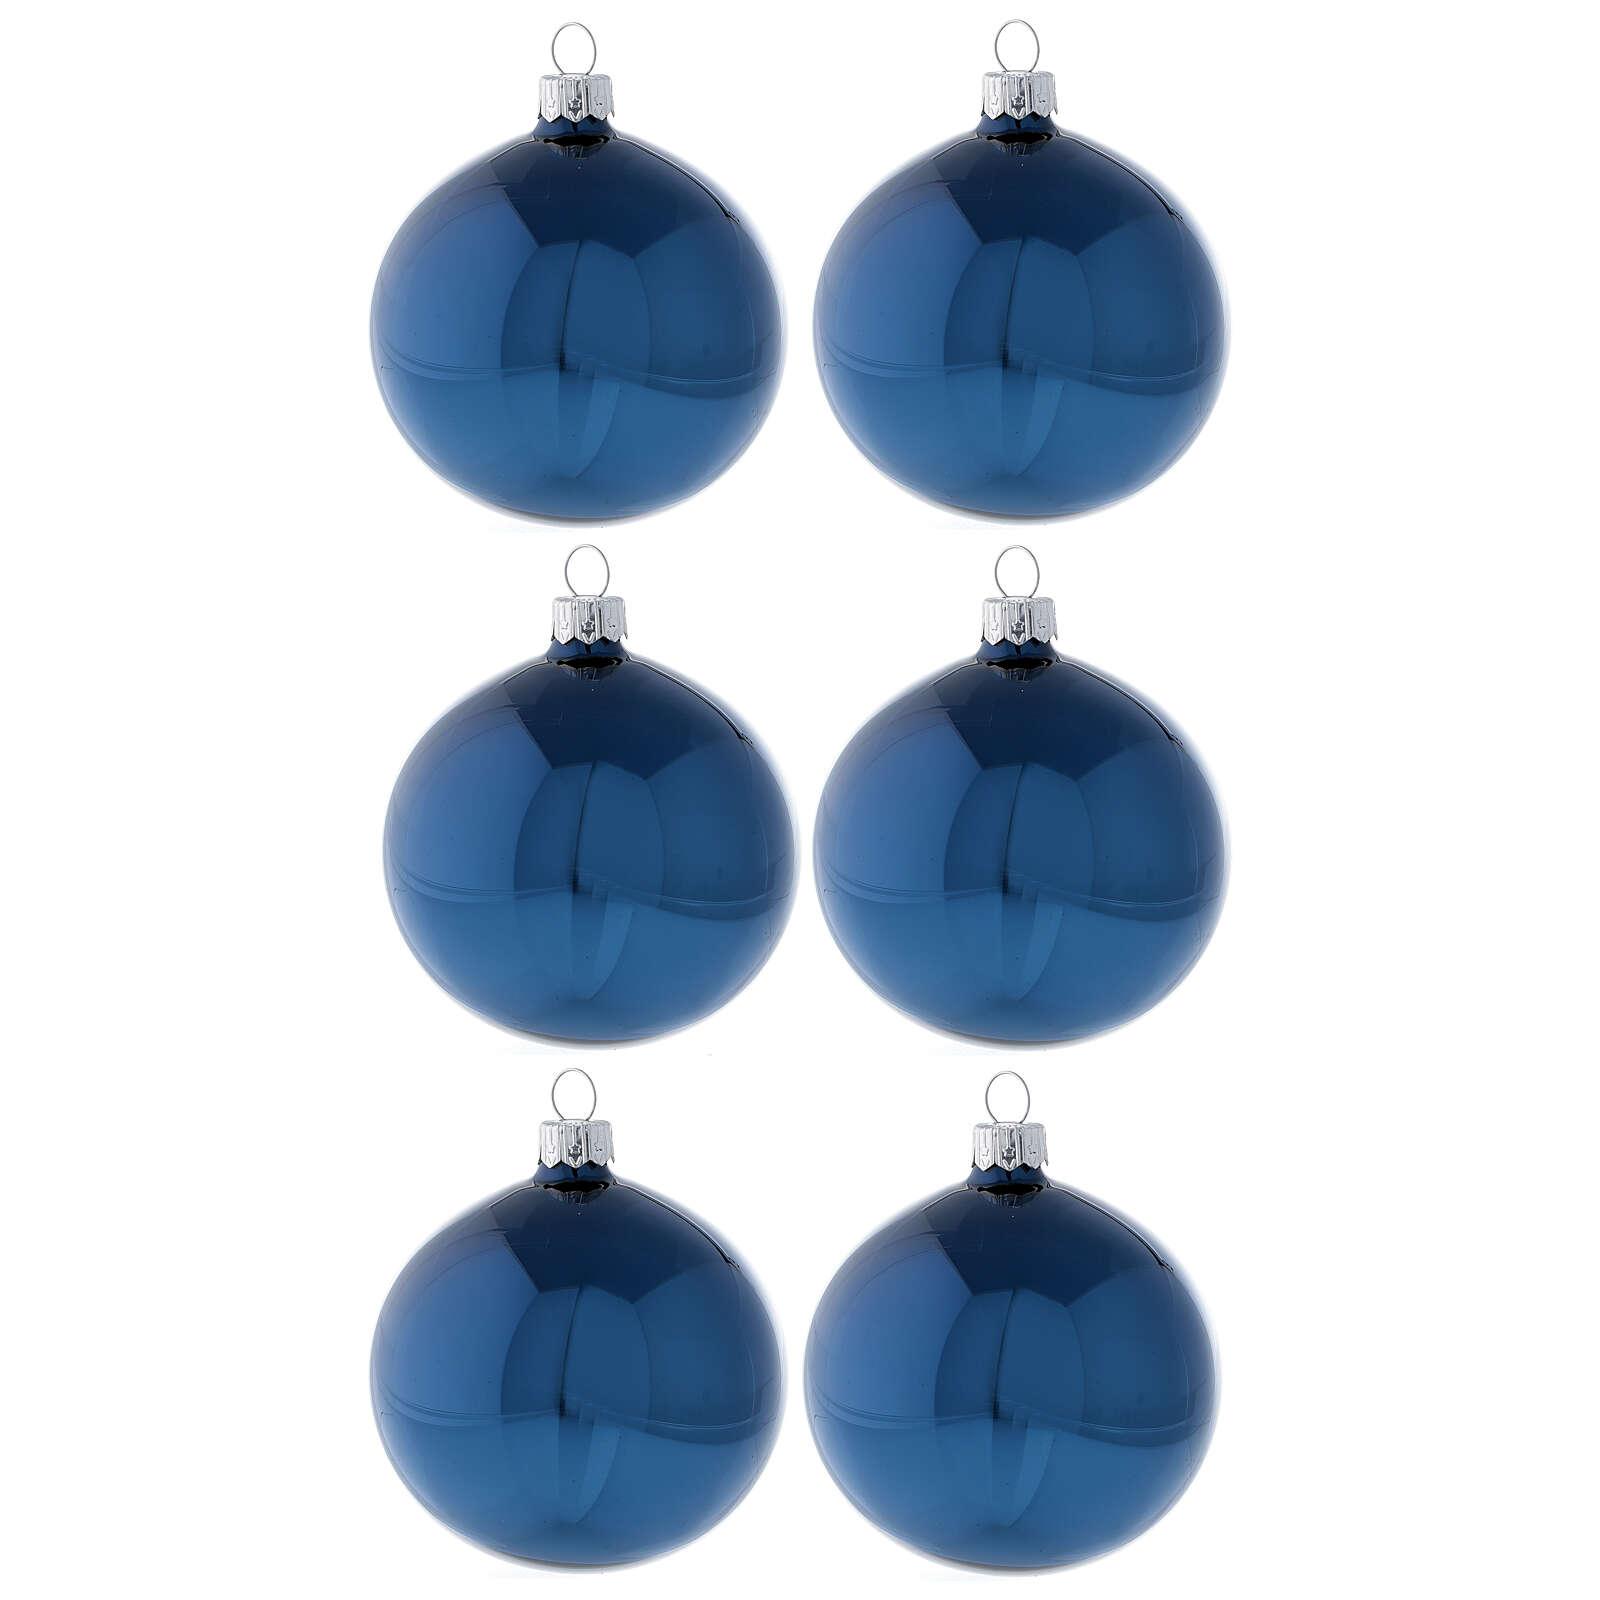 Shiny blue Christmas tree ornaments blown glass 80 mm 6 pcs 4